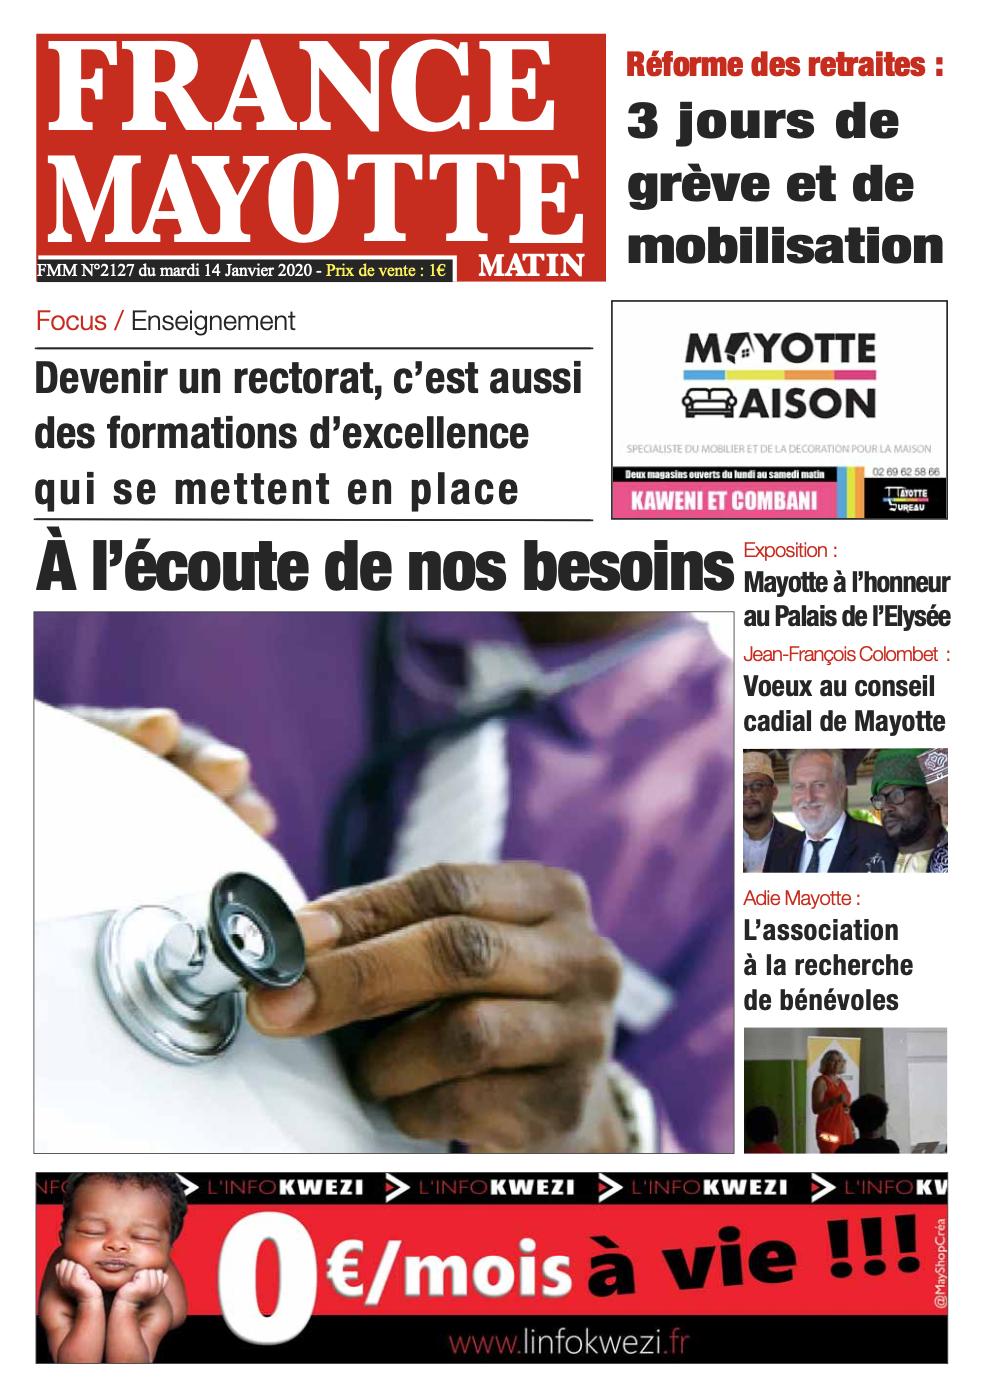 France Mayotte Mardi 14 janvier 2020